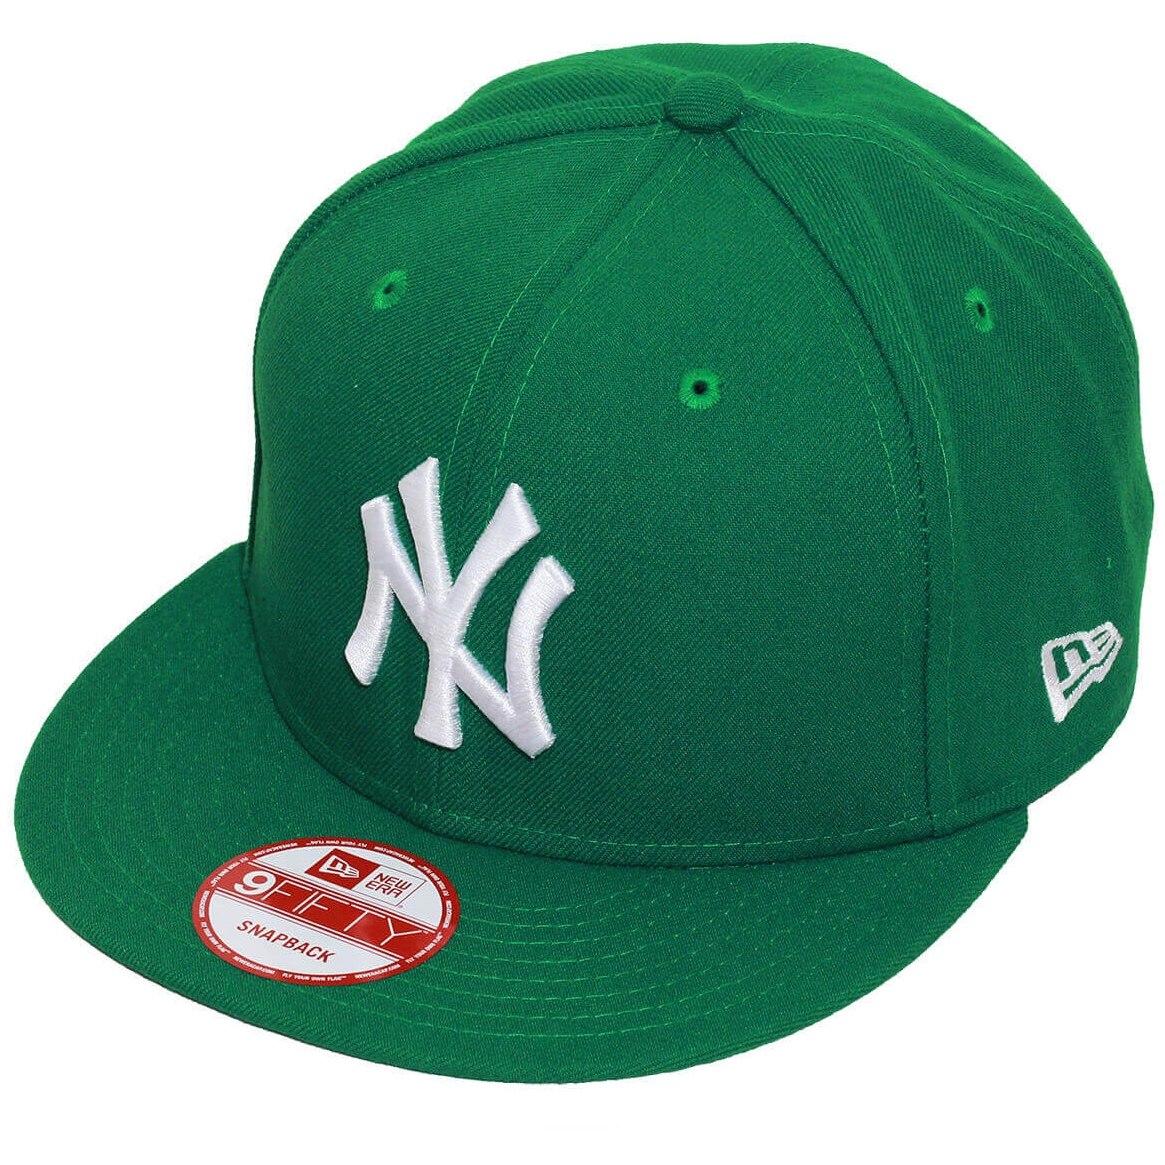 9871b42eb3316 boné new era aba reta snapback mlb ny yankees colors verde. Carregando zoom.